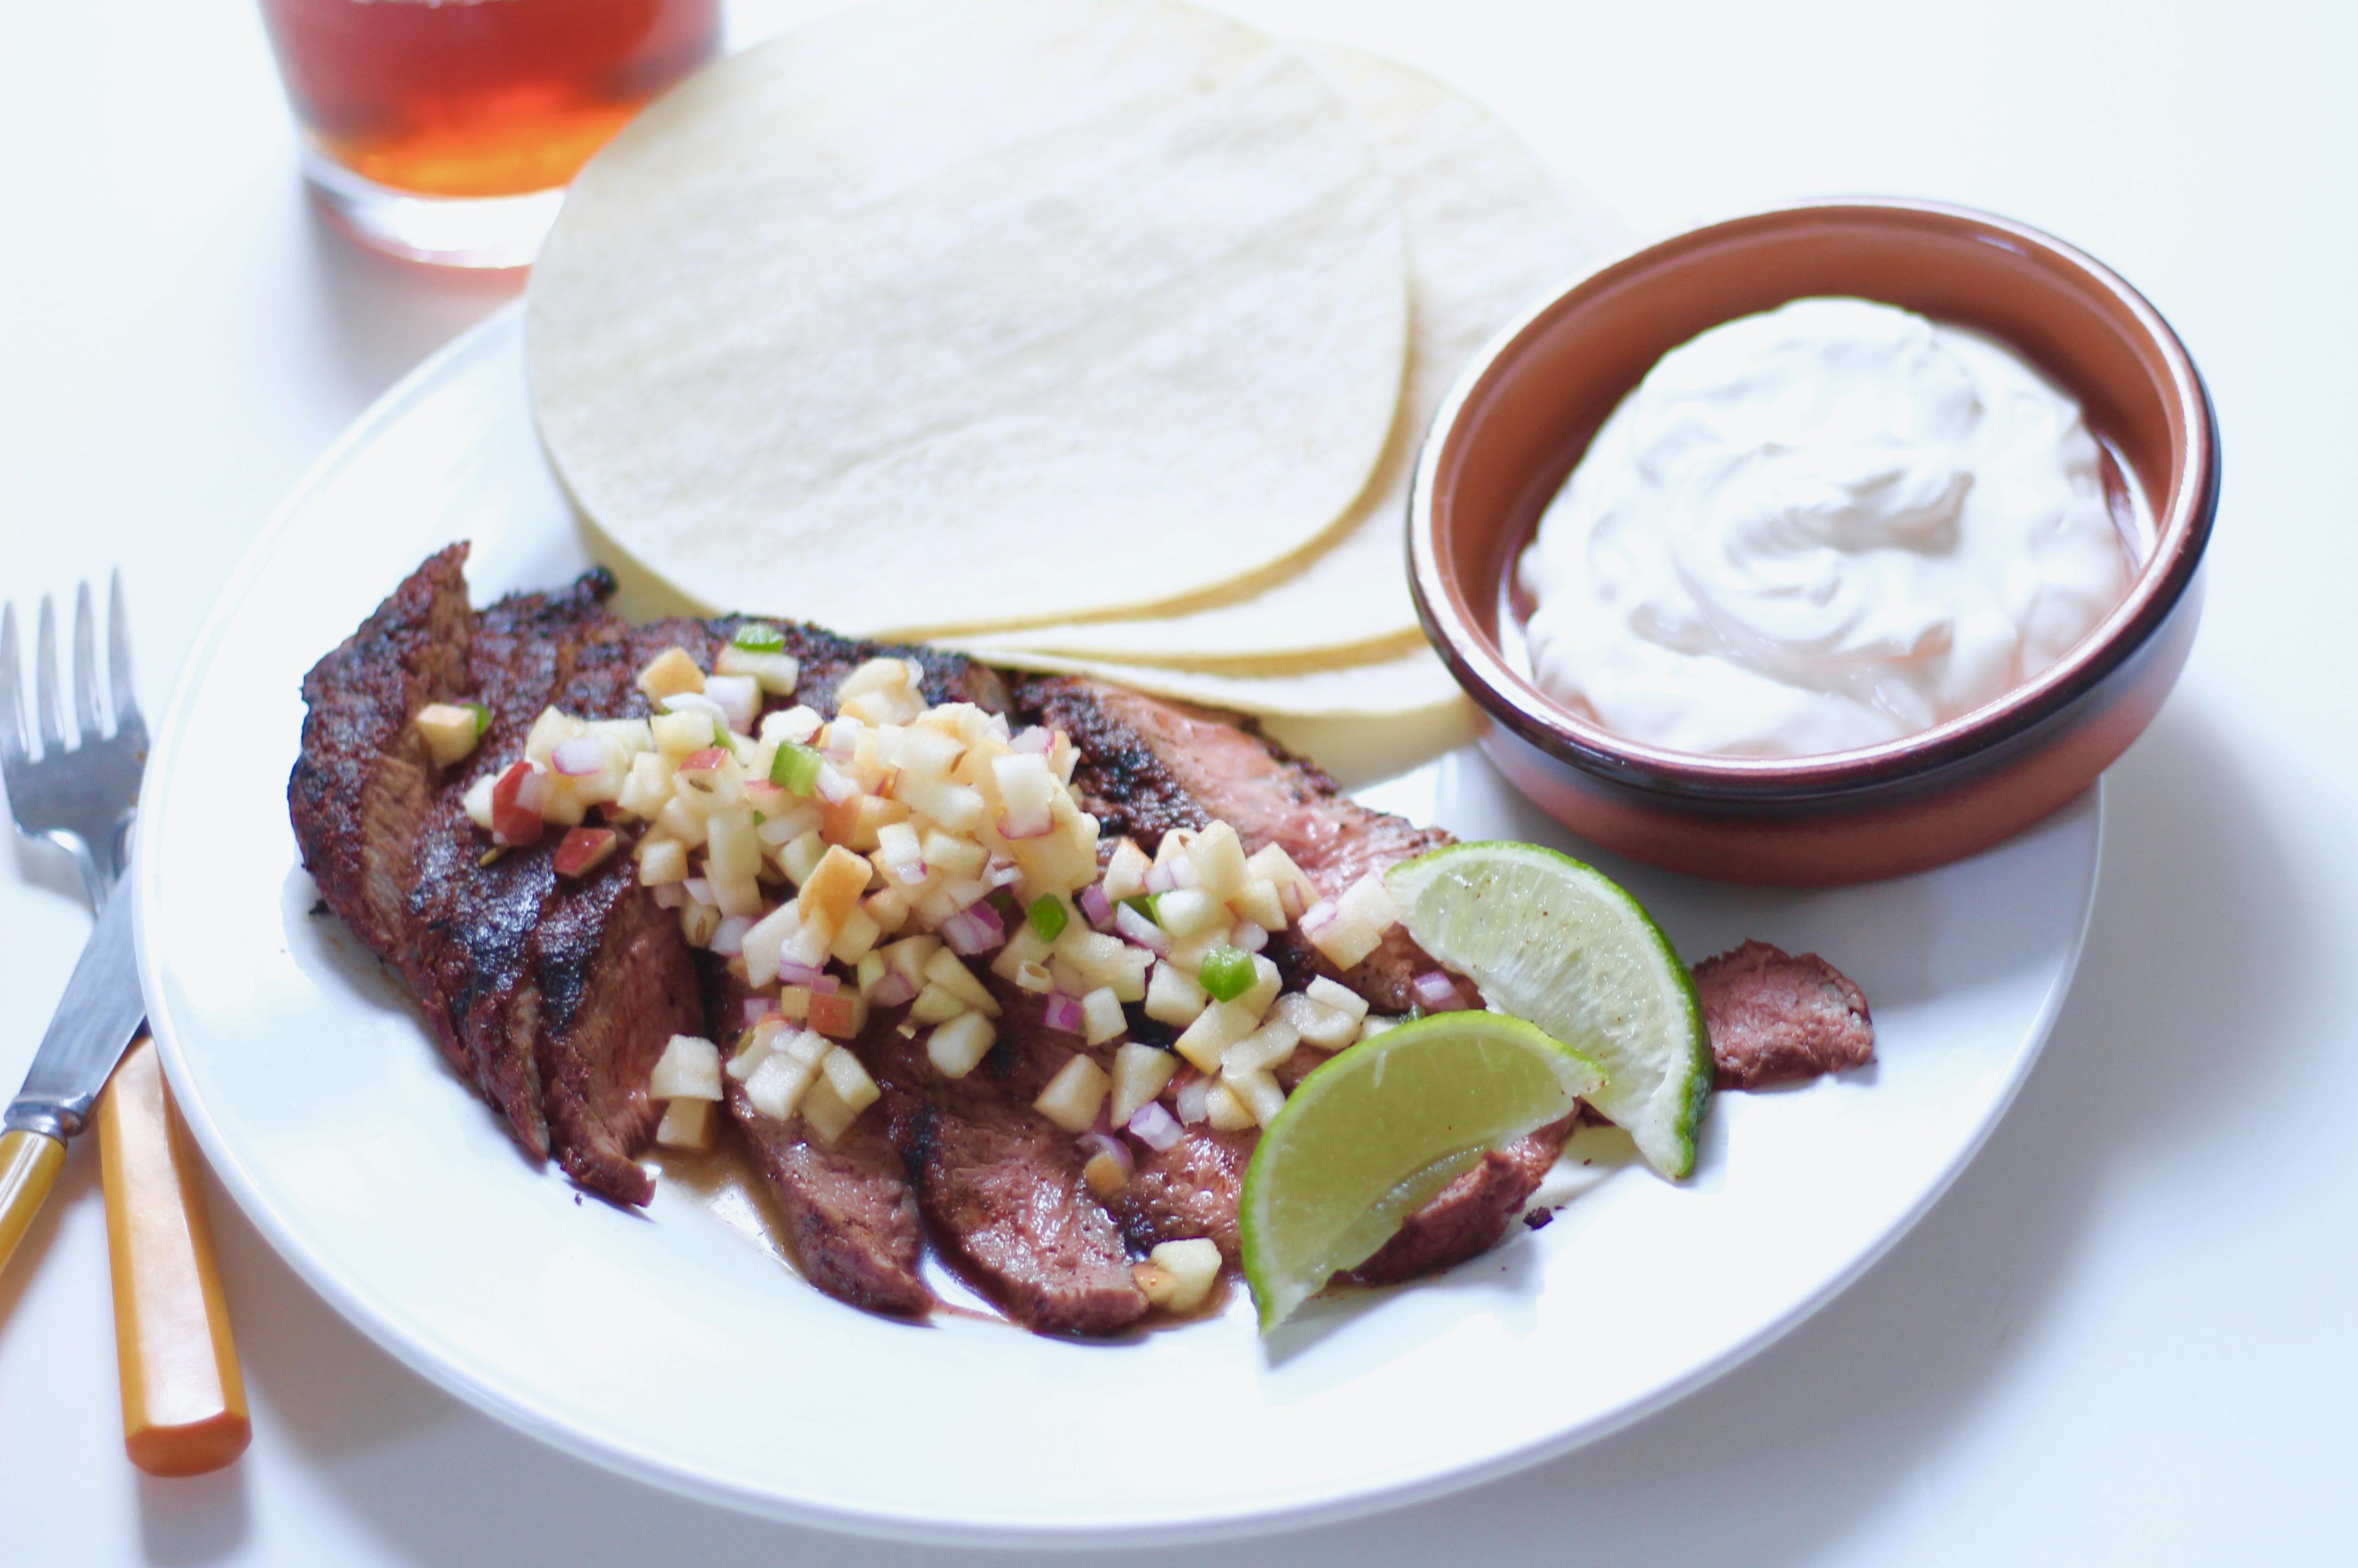 steak with apple jalapeño salsa and tortillas